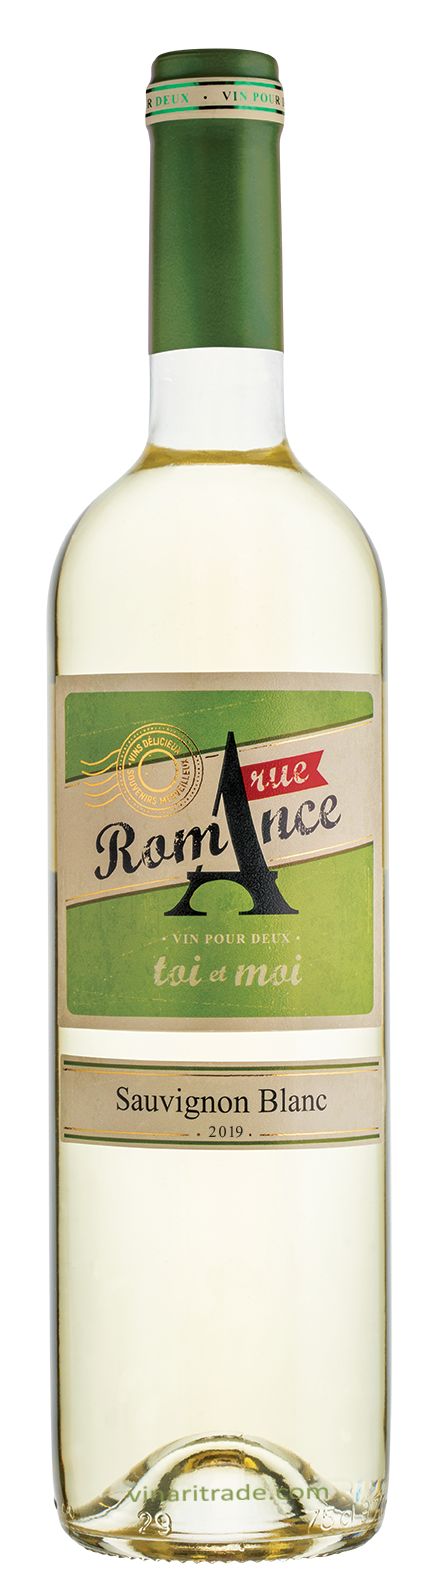 Бяло Вино Рю Романс Совиньон Блан 0.75 л, Домейн Бойар